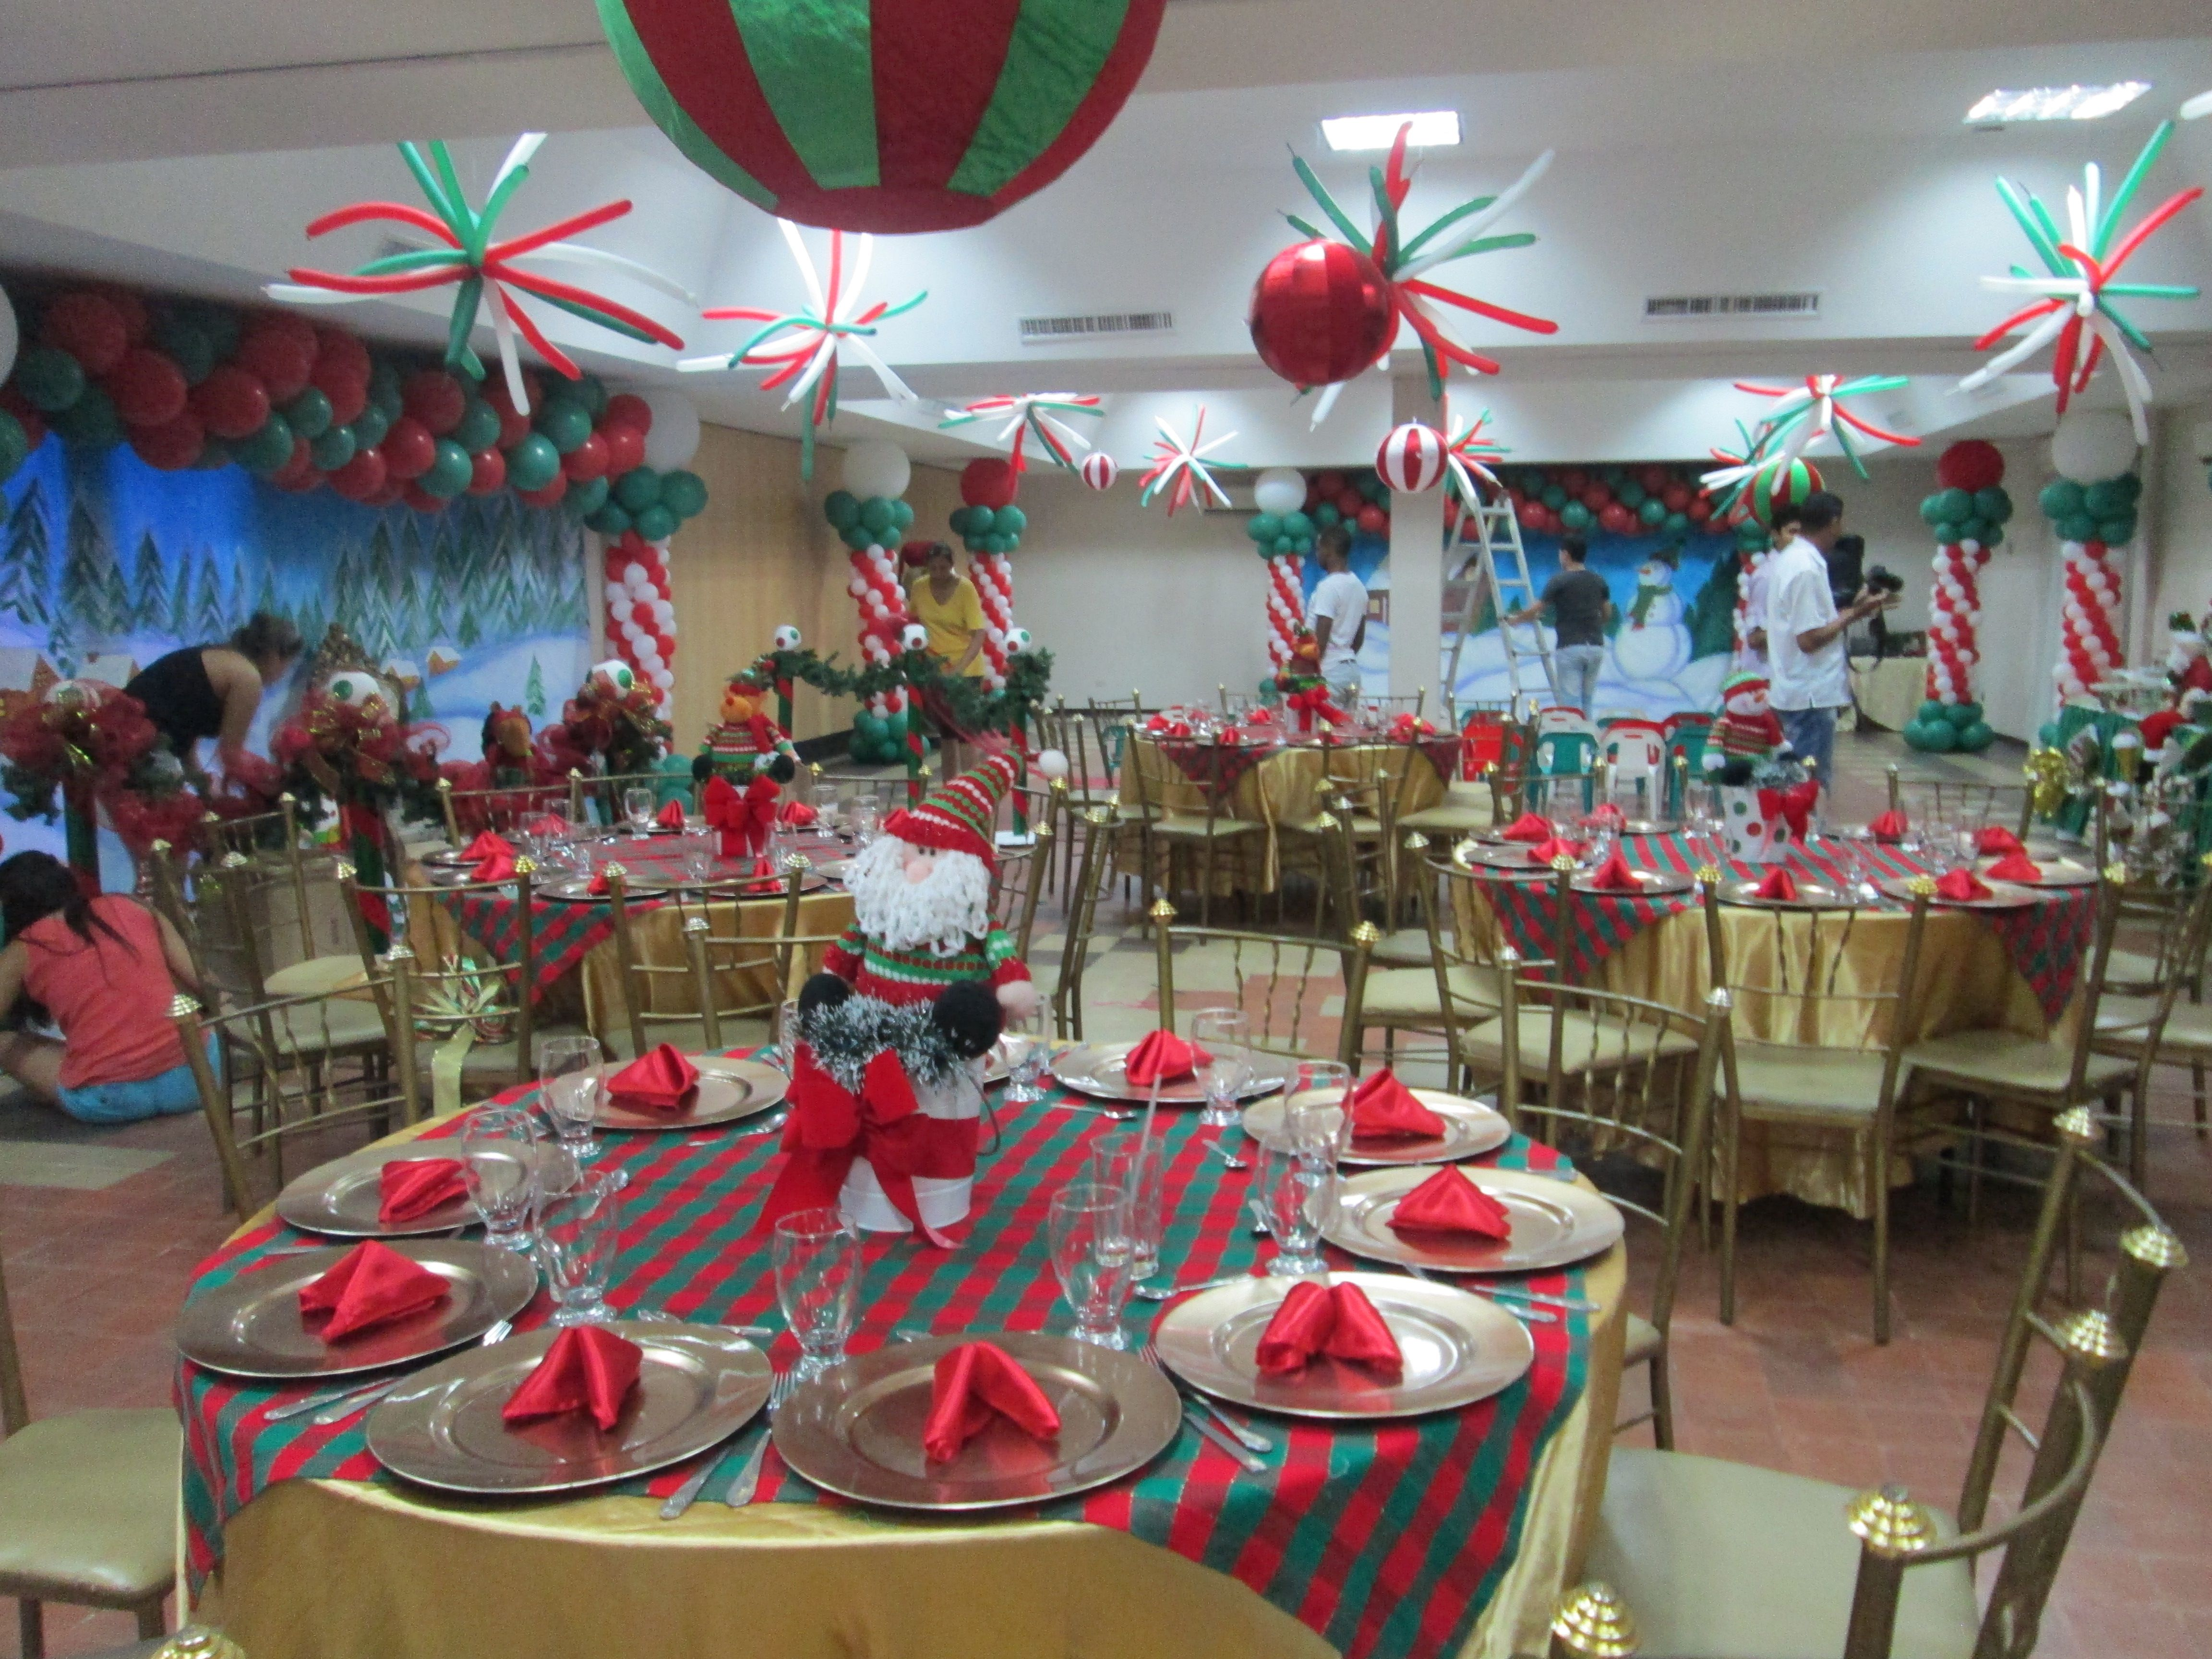 Cumplea os motivo navidad d decoracion de cumplea os 3 pinterest cumplea os navidad y - Decoracion fiesta navidad ...